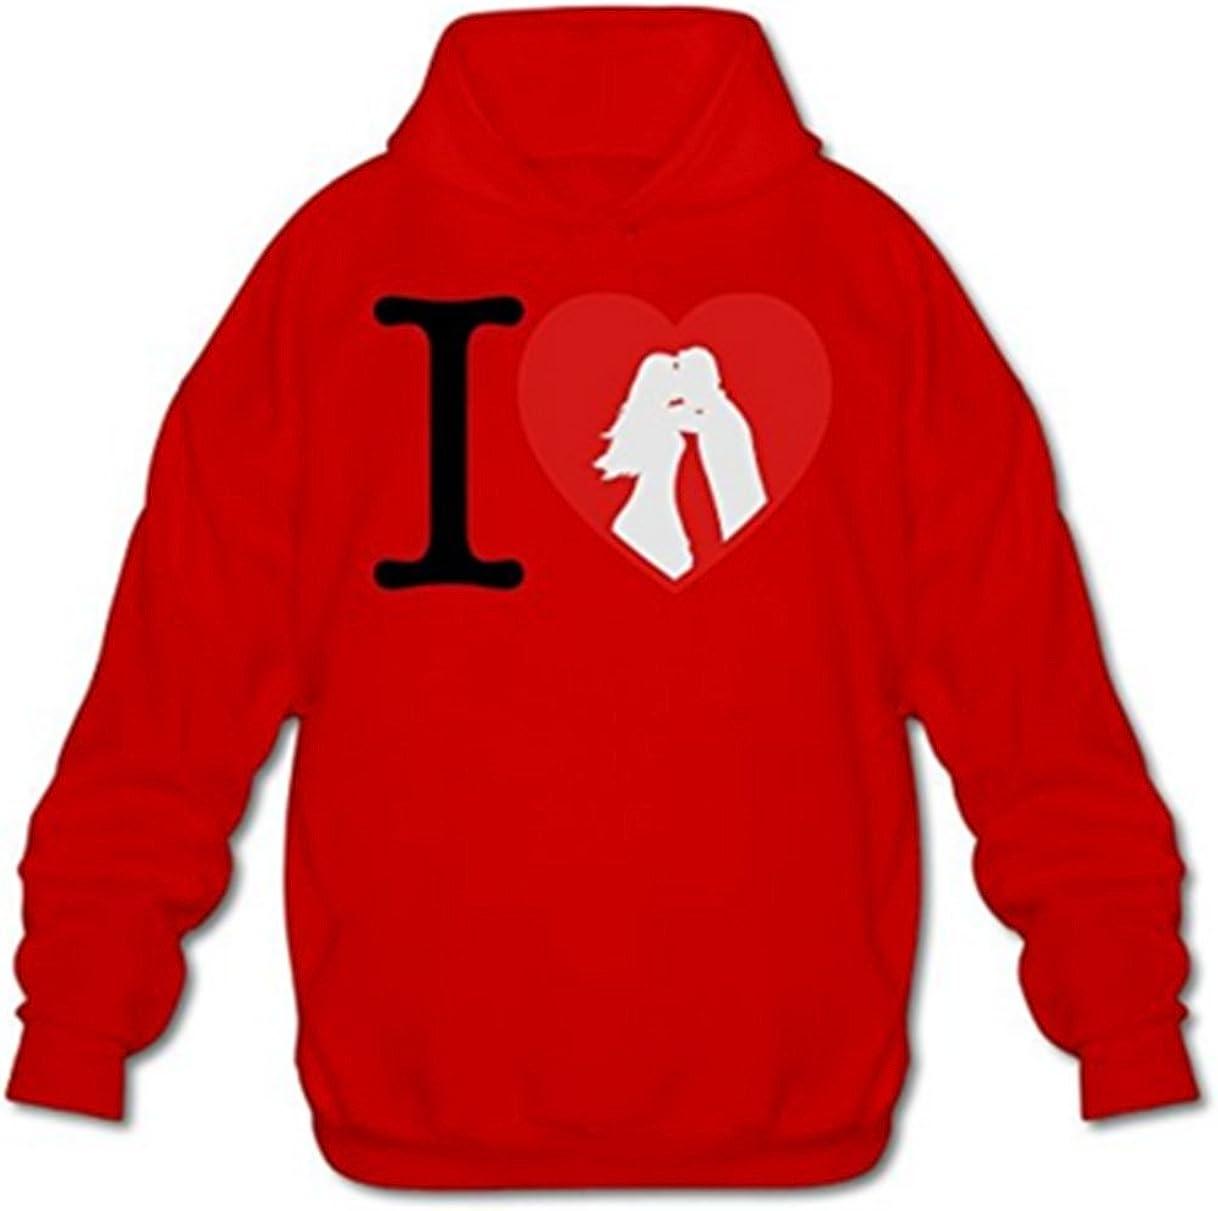 Clothing Men tisamarket.net MOOCMTEE Man Sweatshirt Cool Classic ...